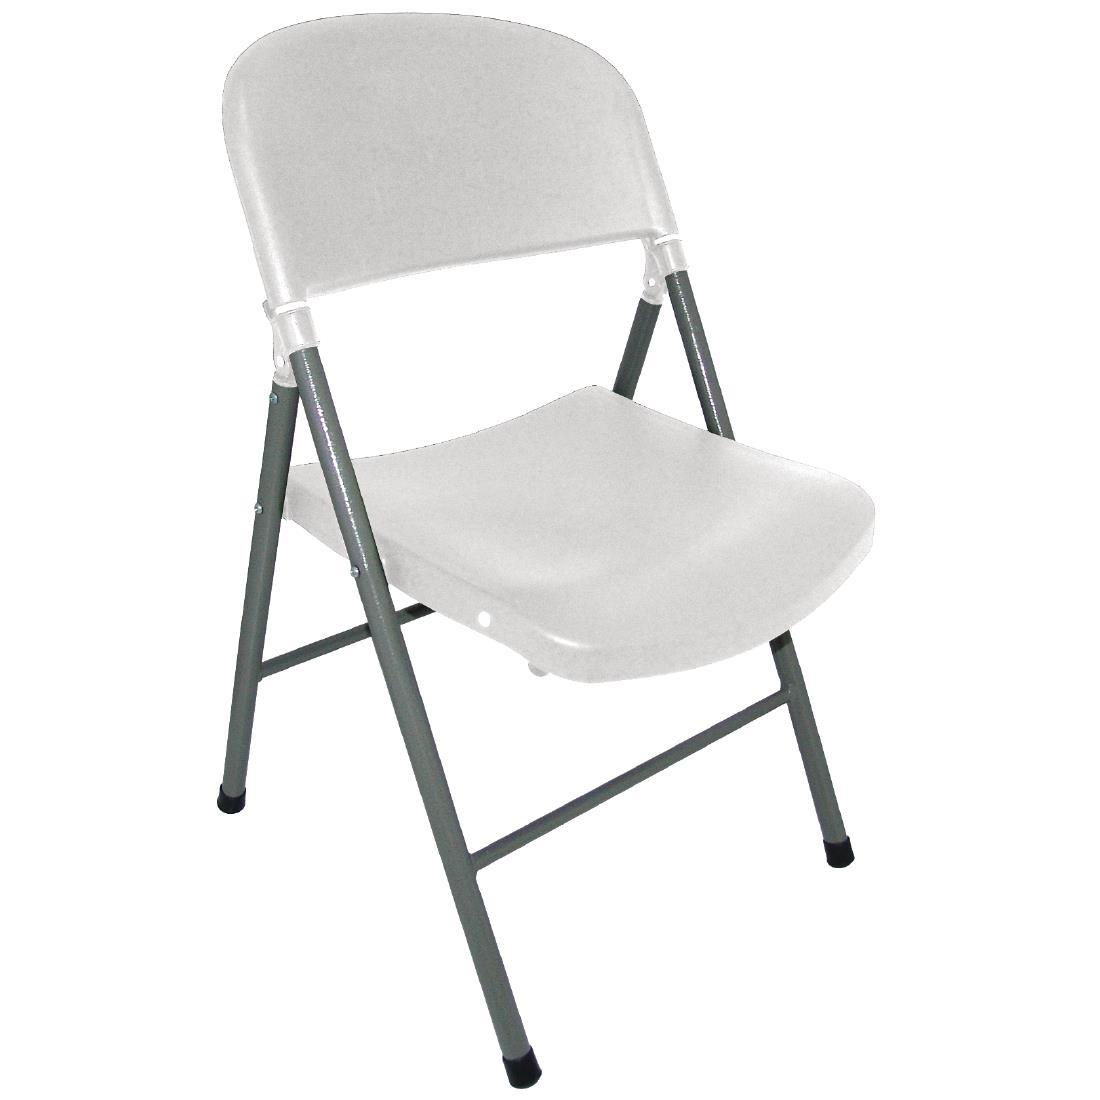 Foldaway Chair - White